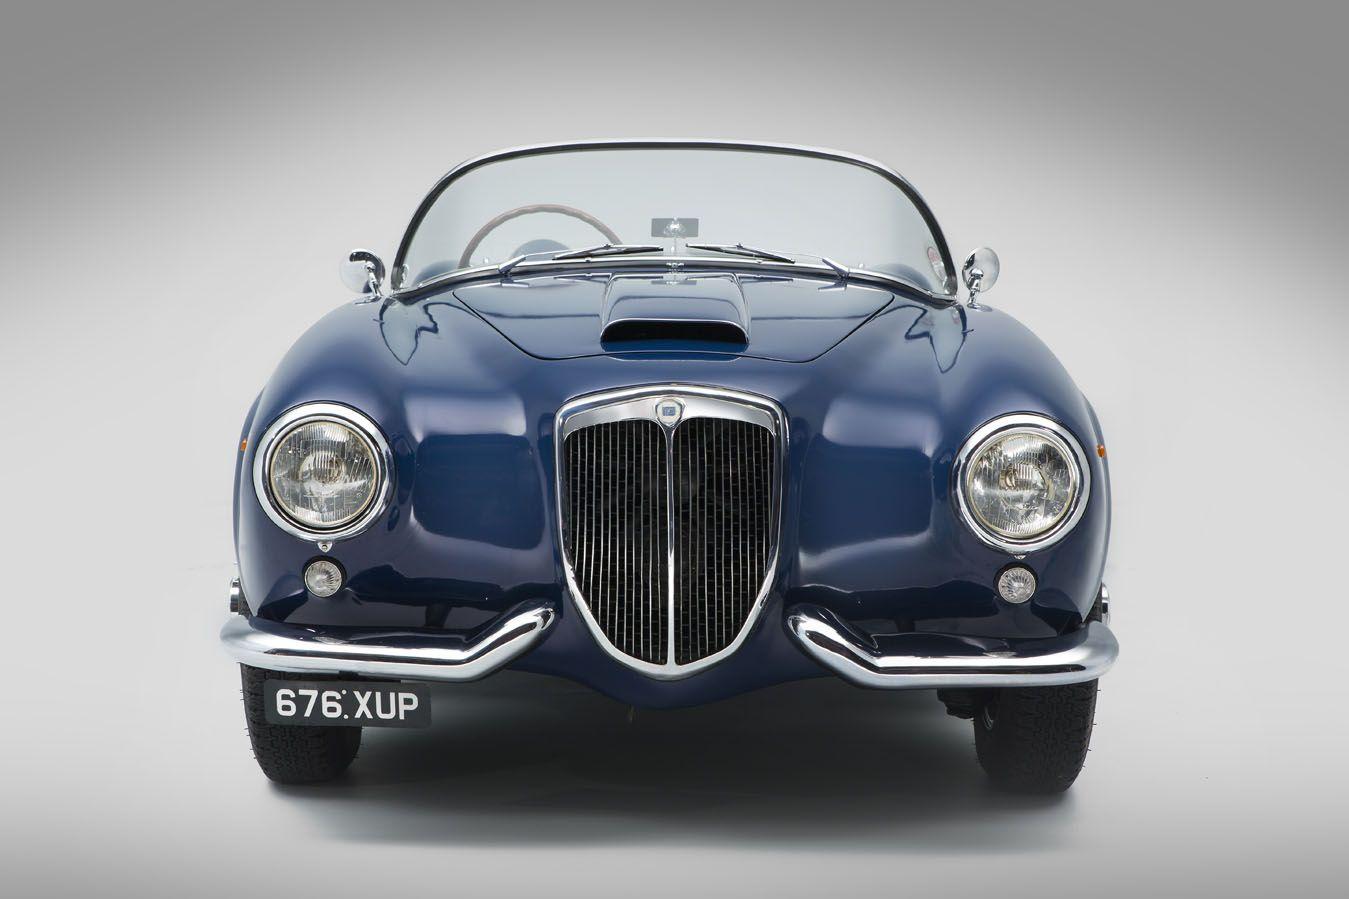 1955 1956 lancia aurelia b24 spider series four designed by pinin farina